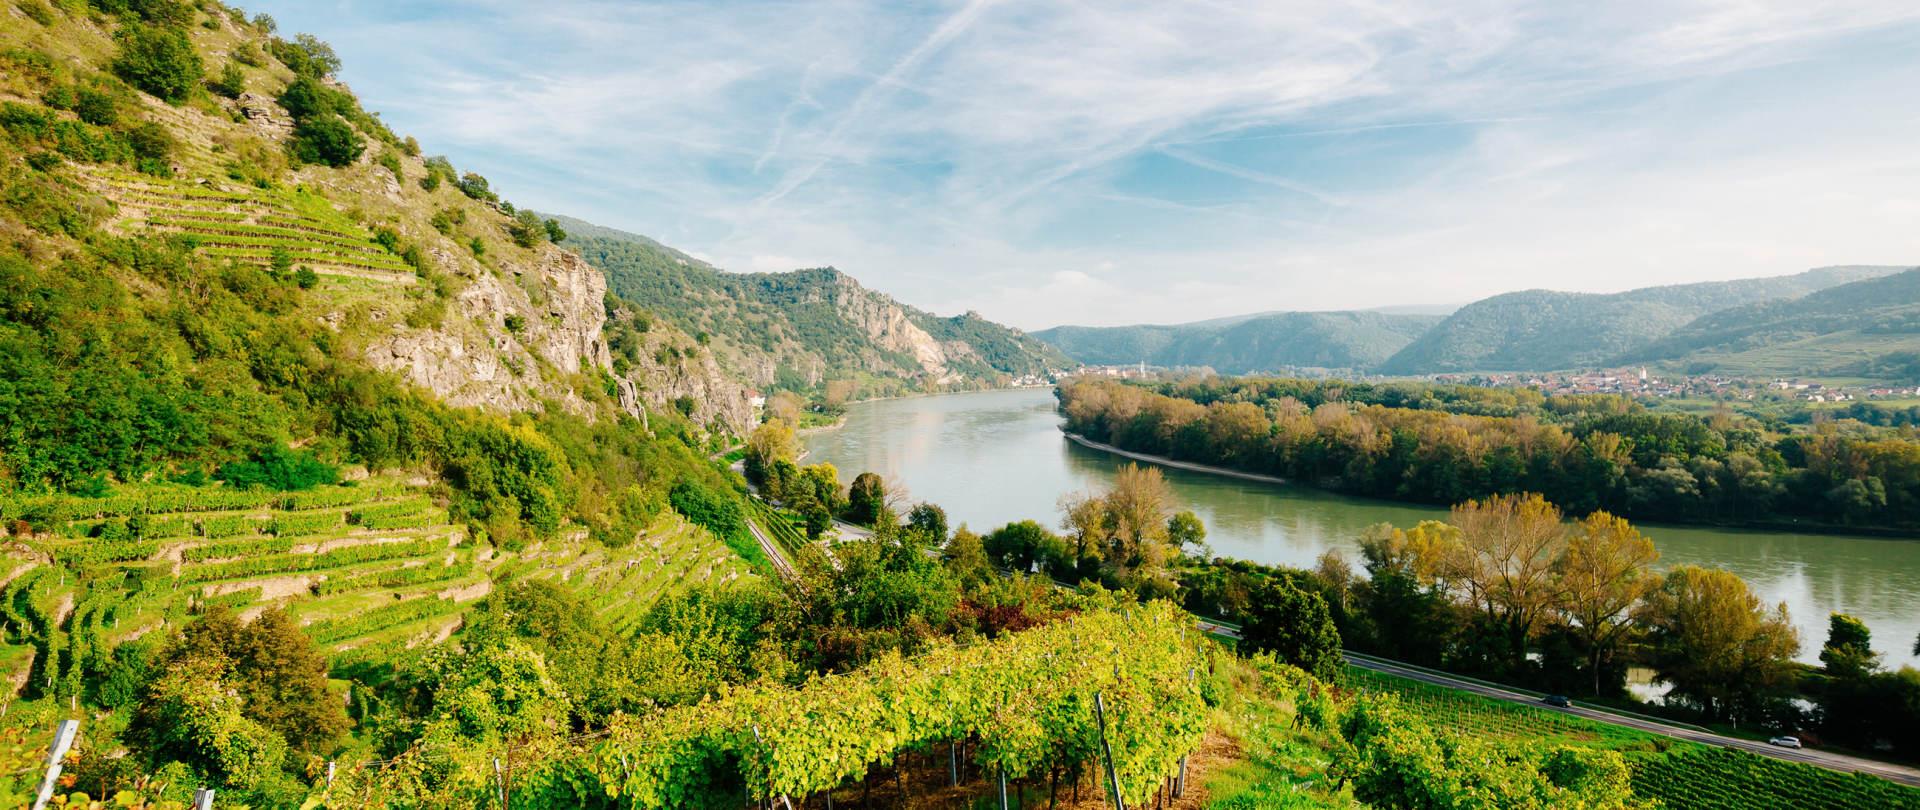 Wachau Karte Donau.Wachau Tour Inklusive Stift Melk